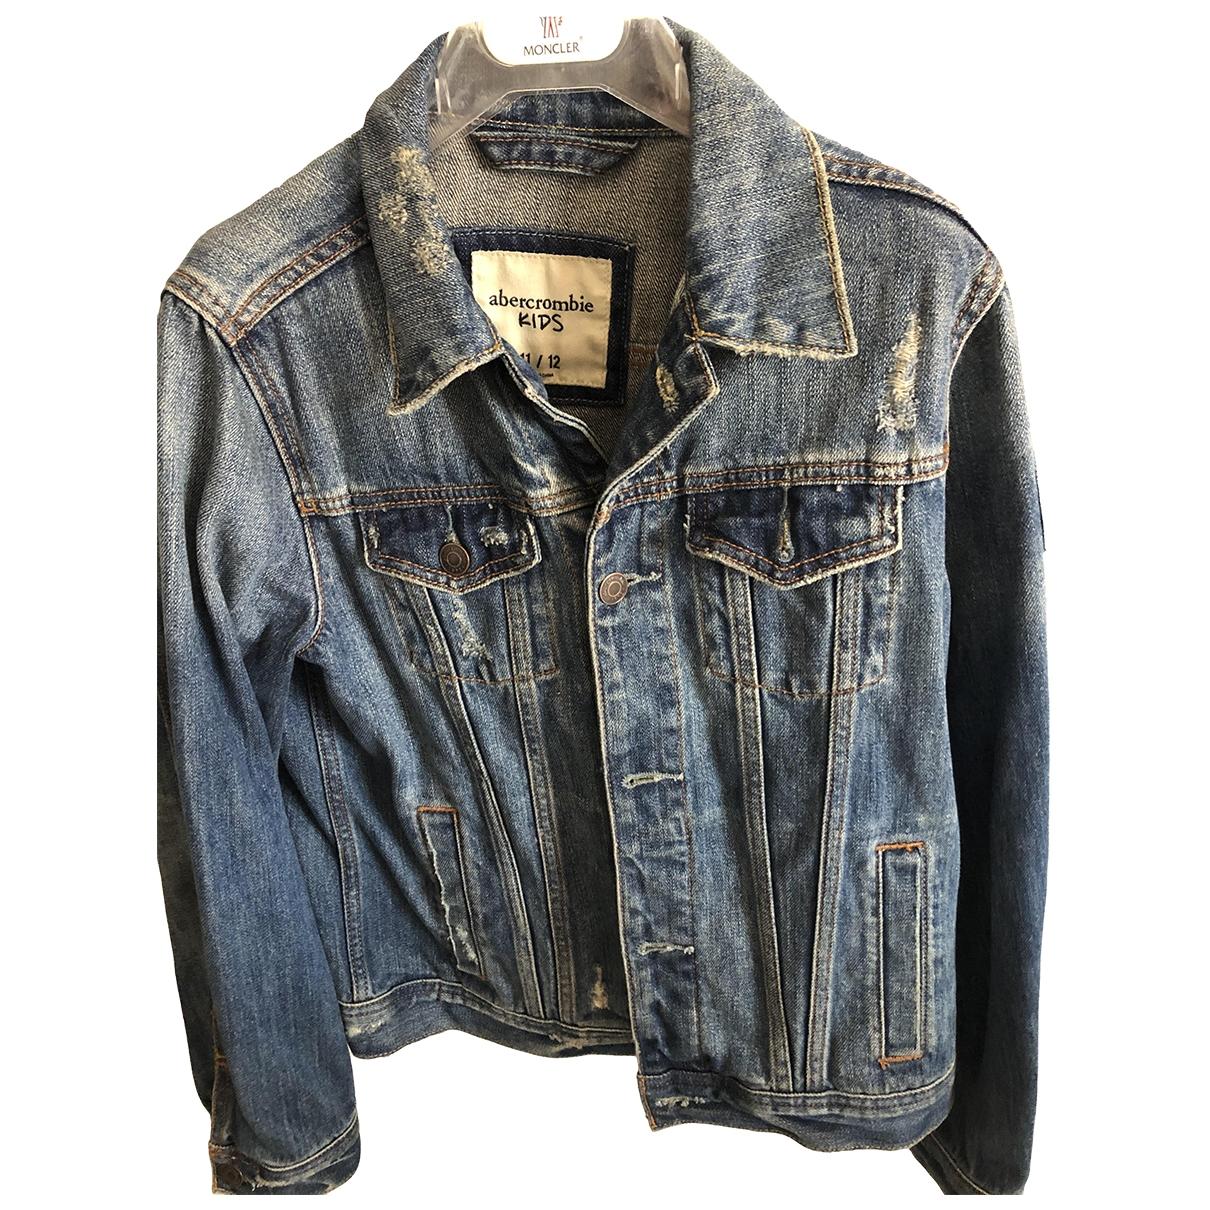 Abercrombie & Fitch \N Jacke, Maentel in  Blau Denim - Jeans